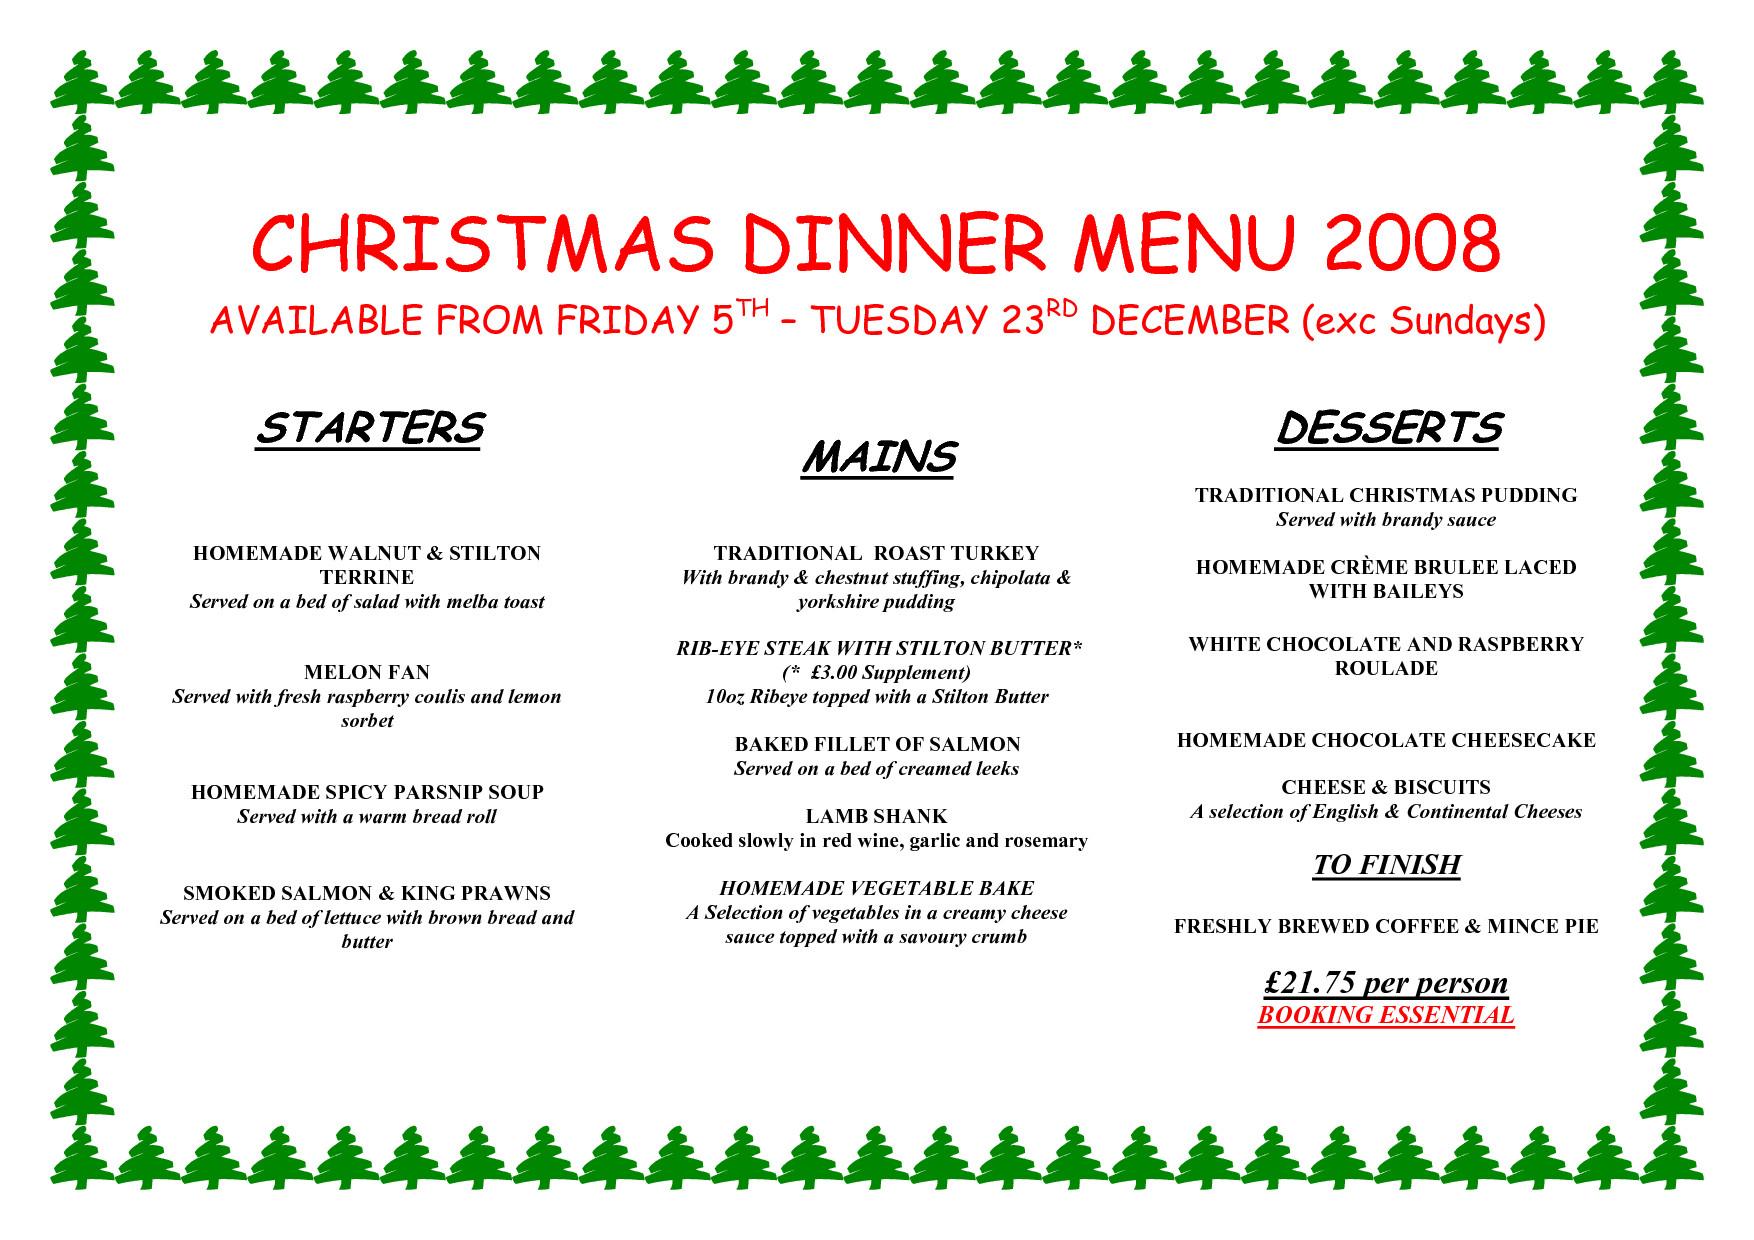 Southern Christmas Dinner Menu Ideas  Christmas Dinner Menu Ideas – Happy Holidays